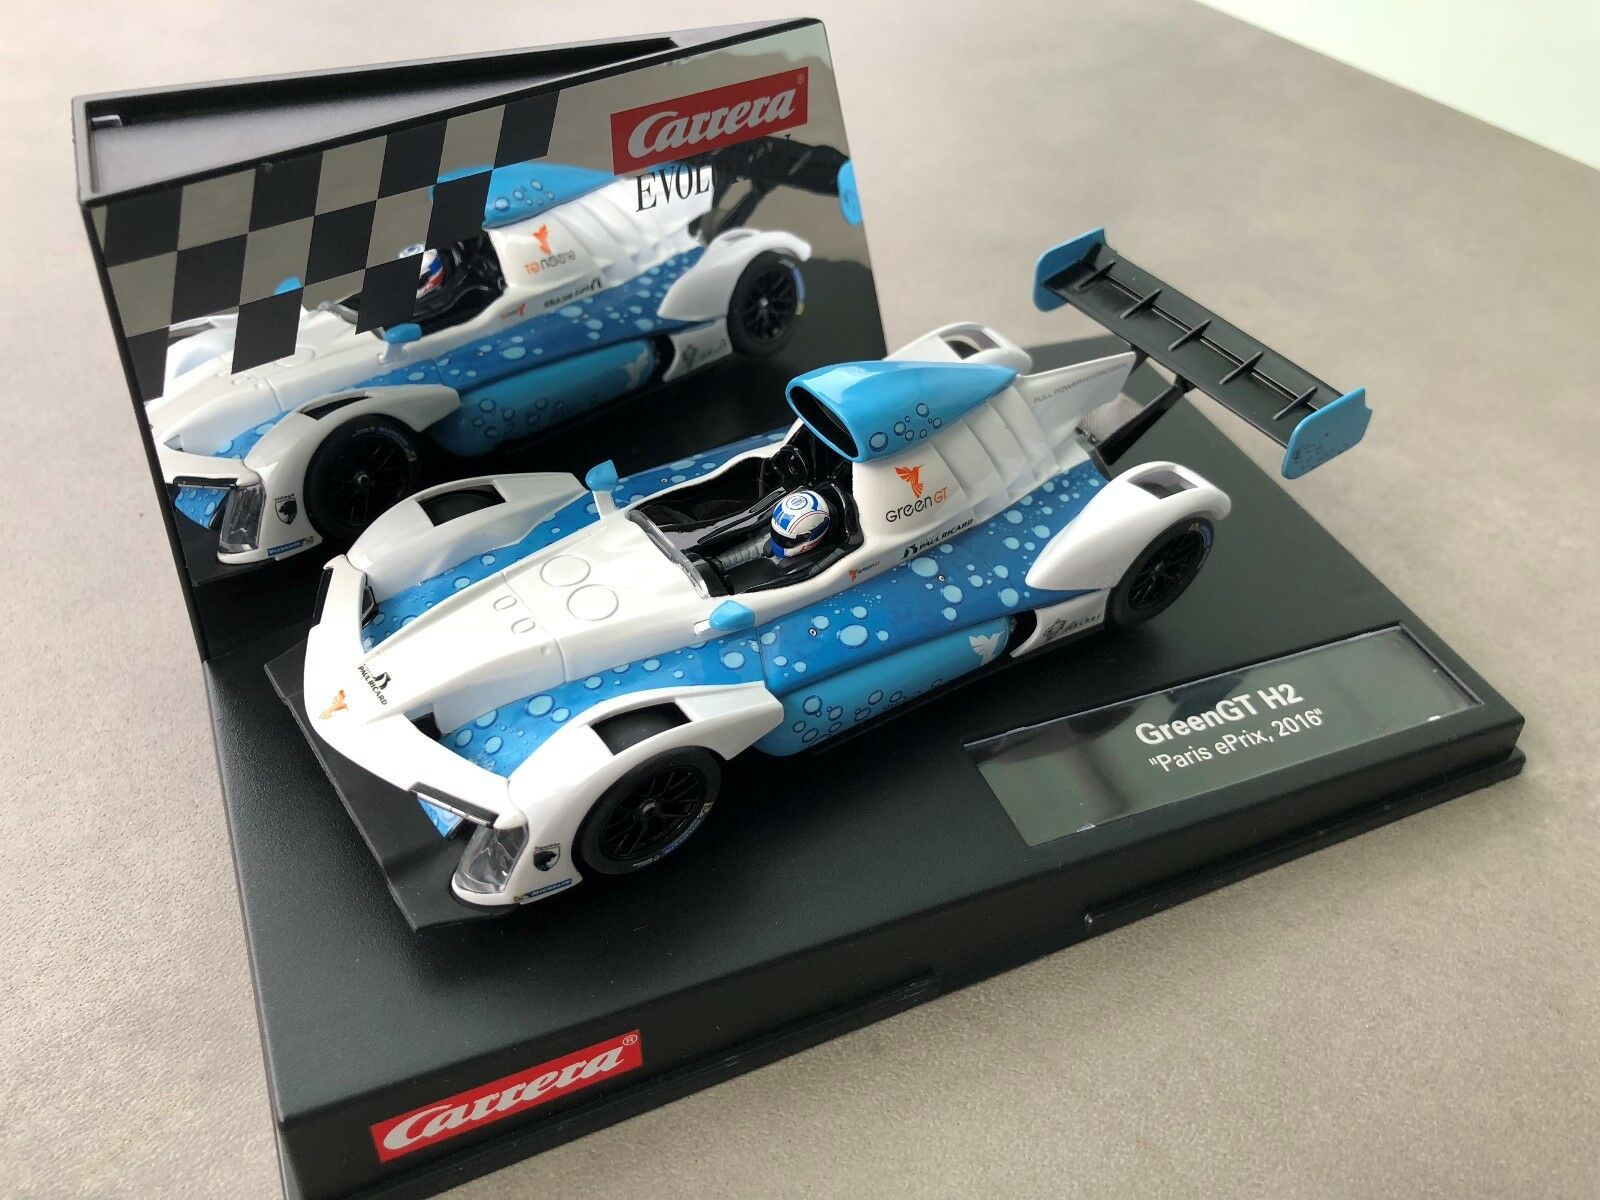 Carrera Evolution 27517 greengt H2   Paris ePrix , 2016 New Sealed Box